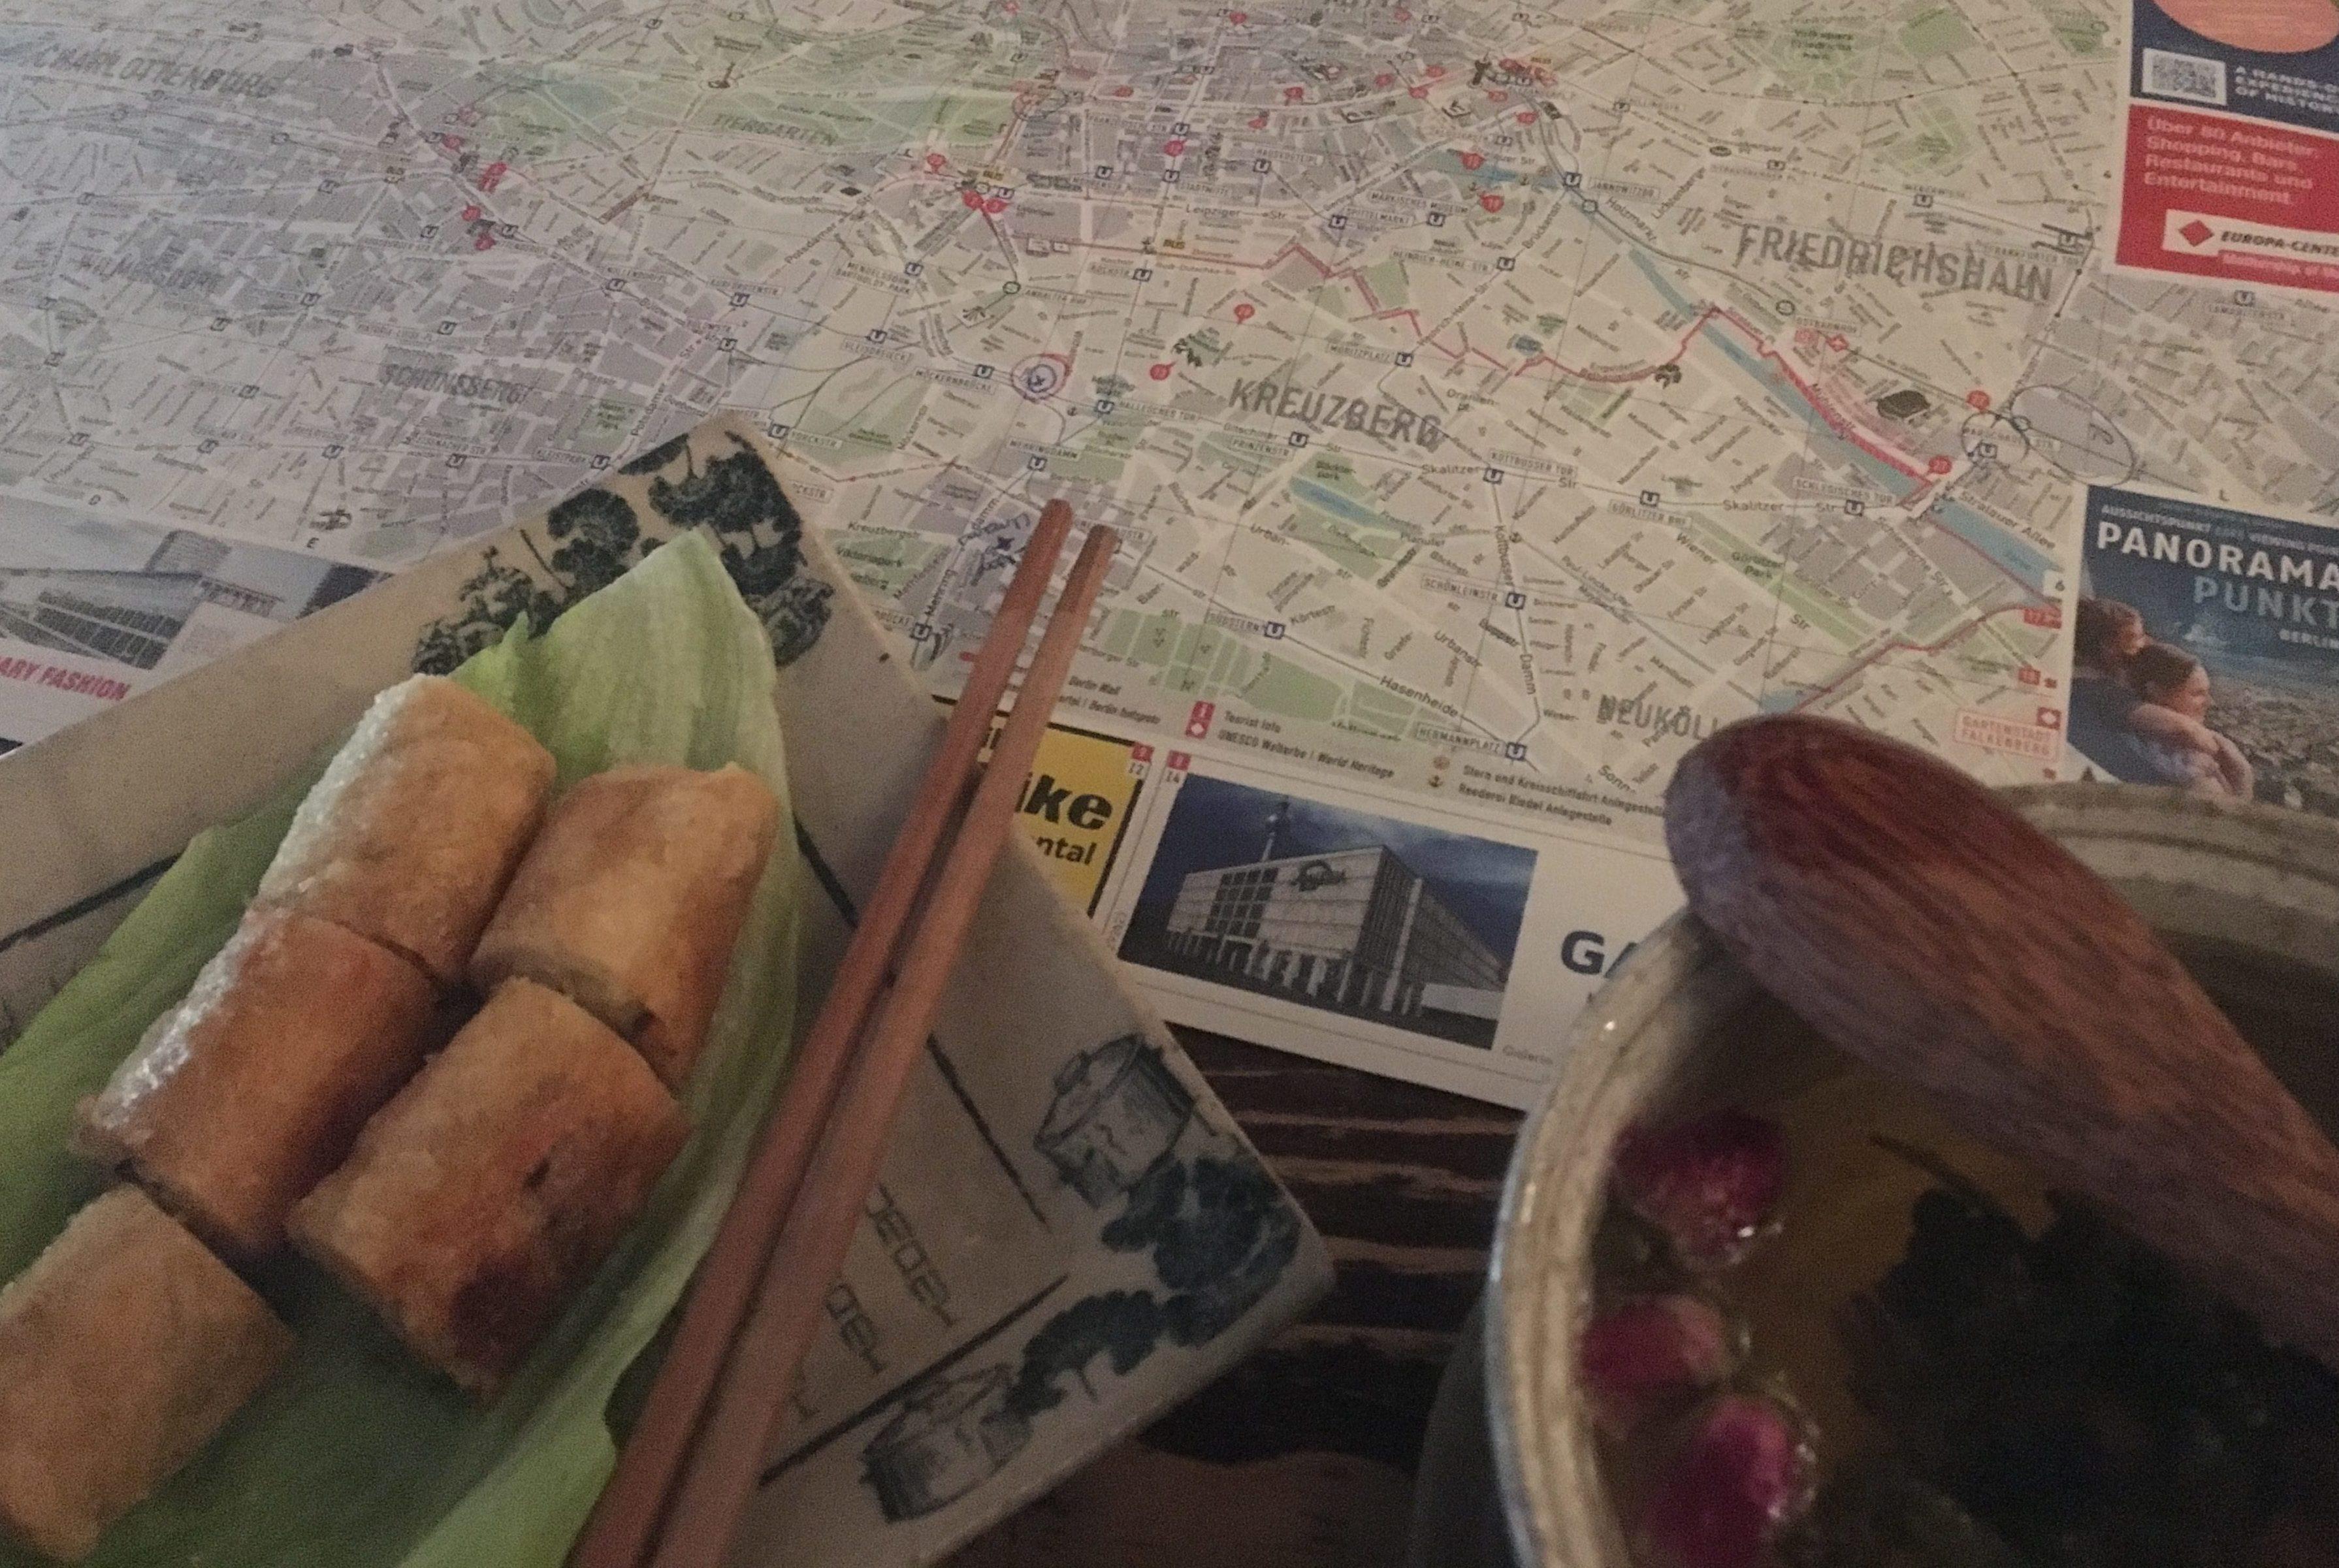 Buddha Rolls and Rose Tea @ Unami, Kreutzberg